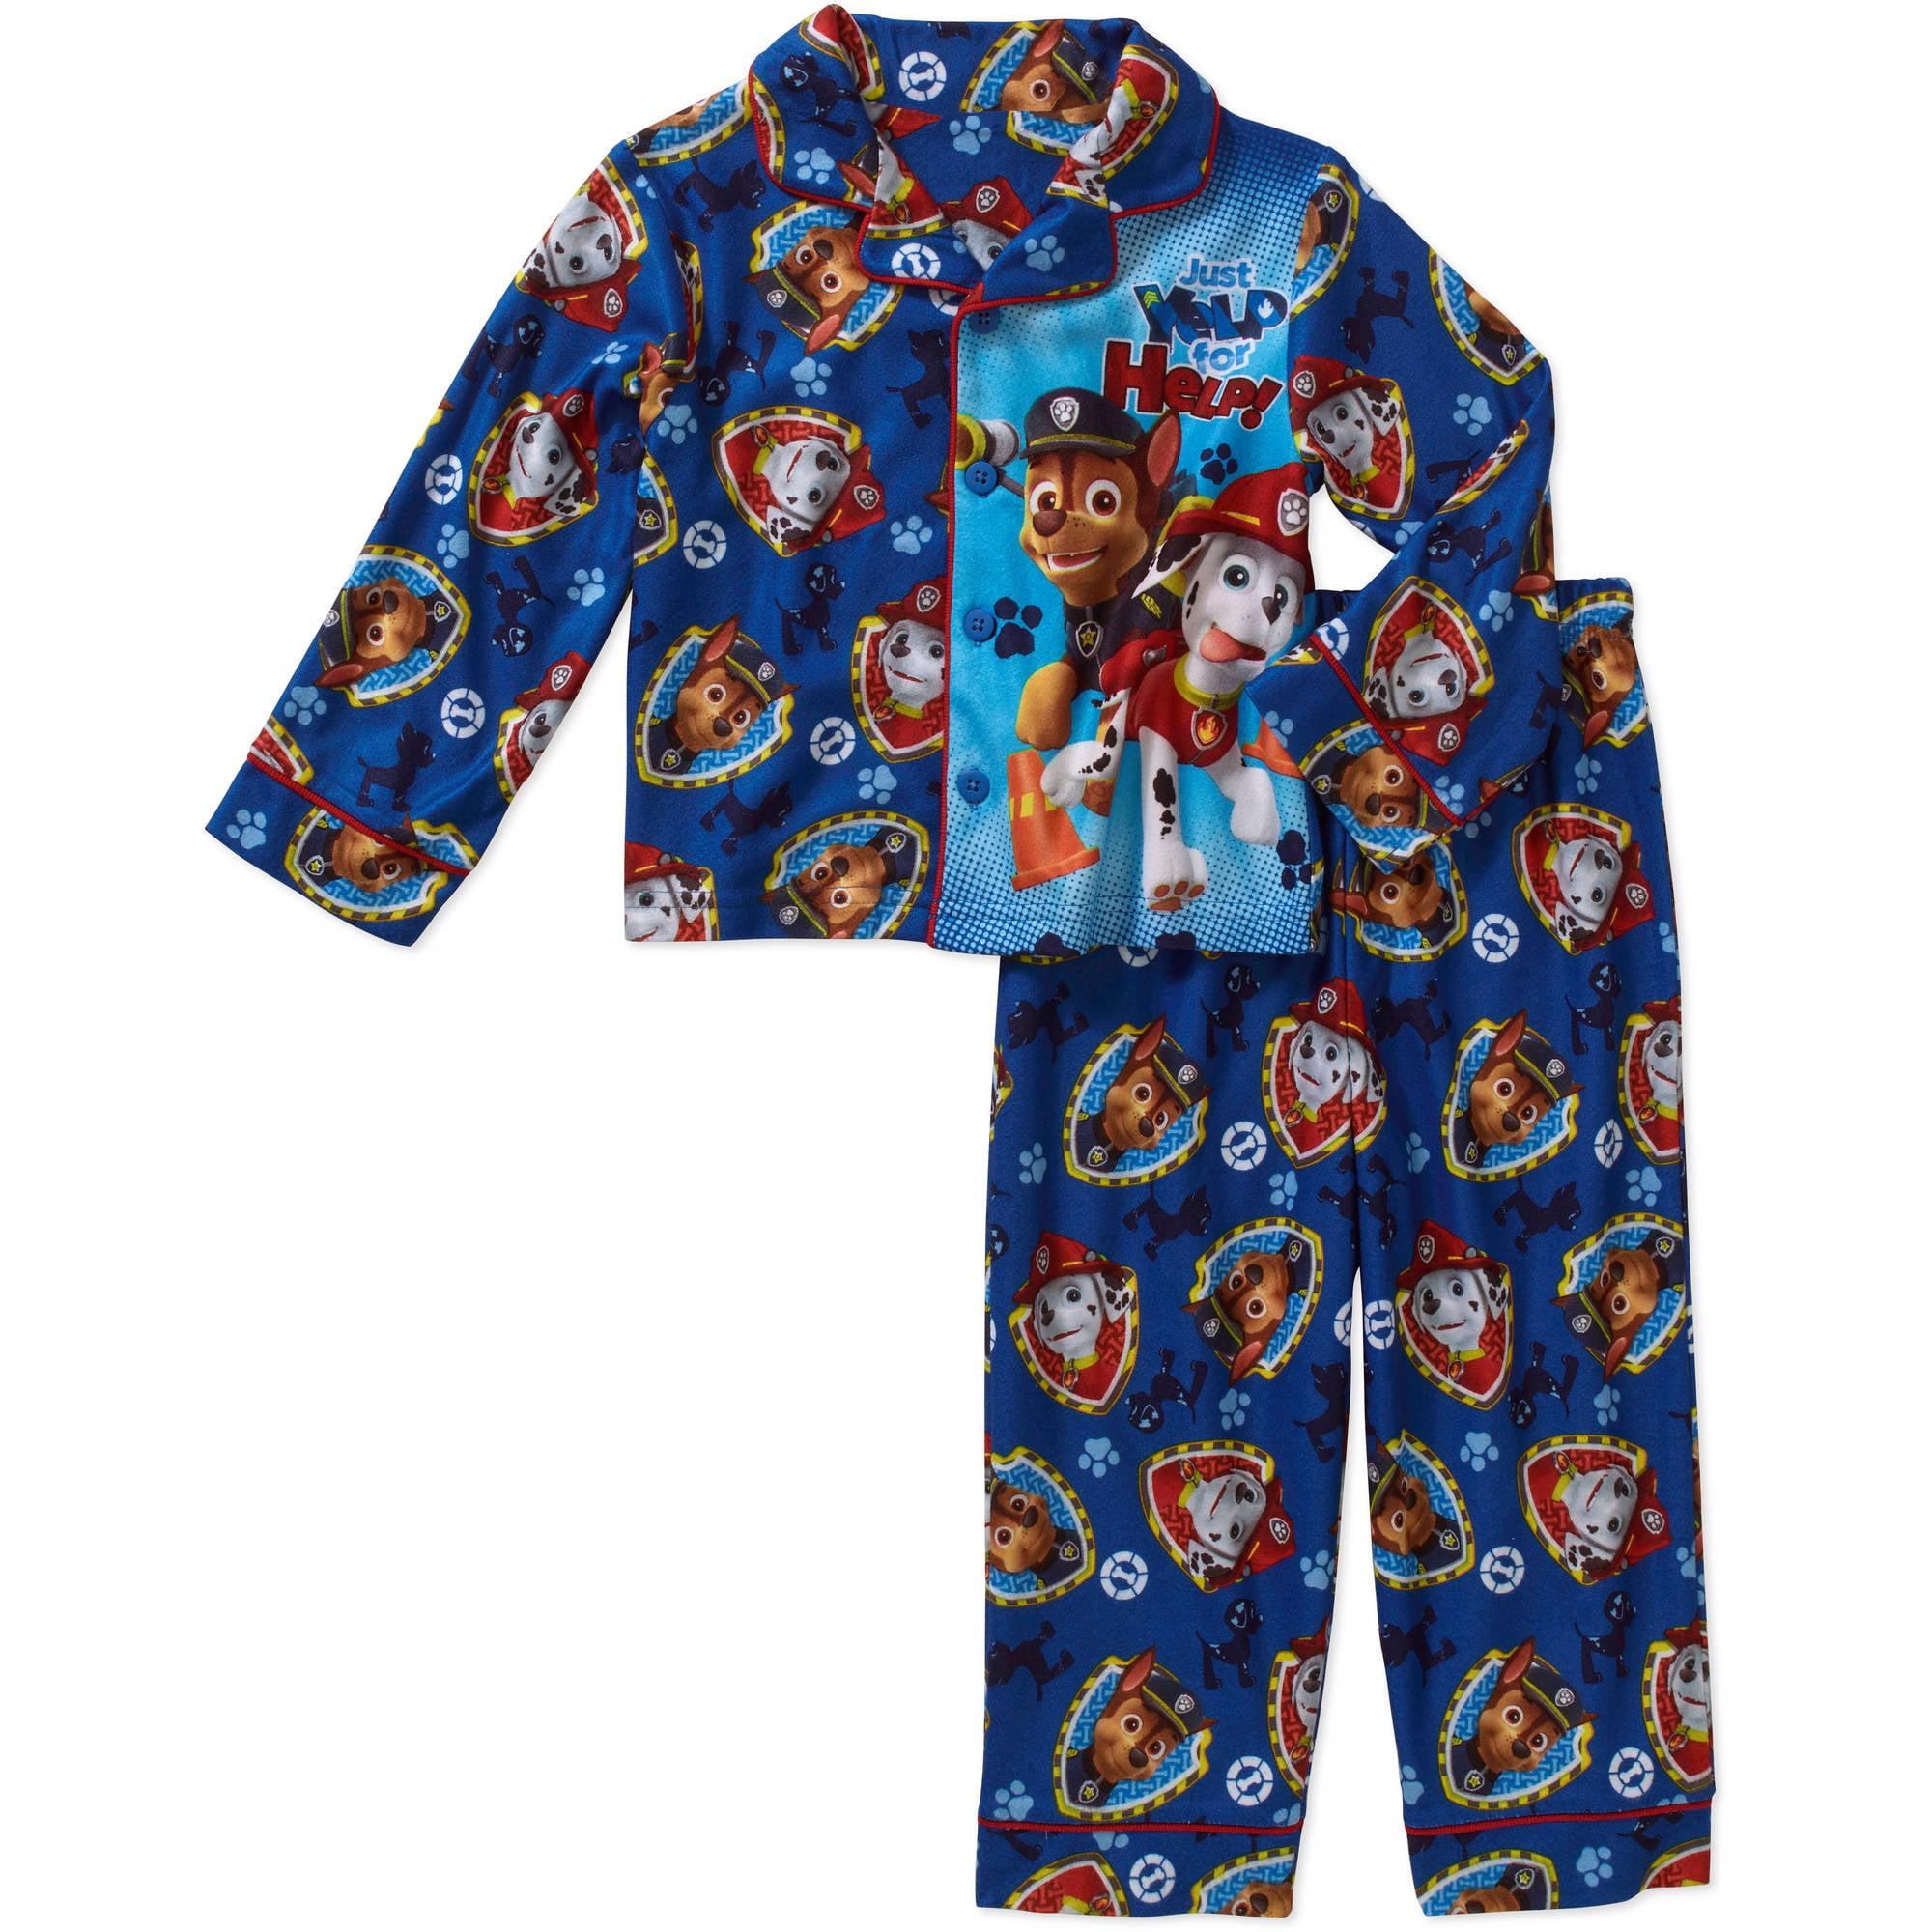 Boys Sleepwear - Walmart.com